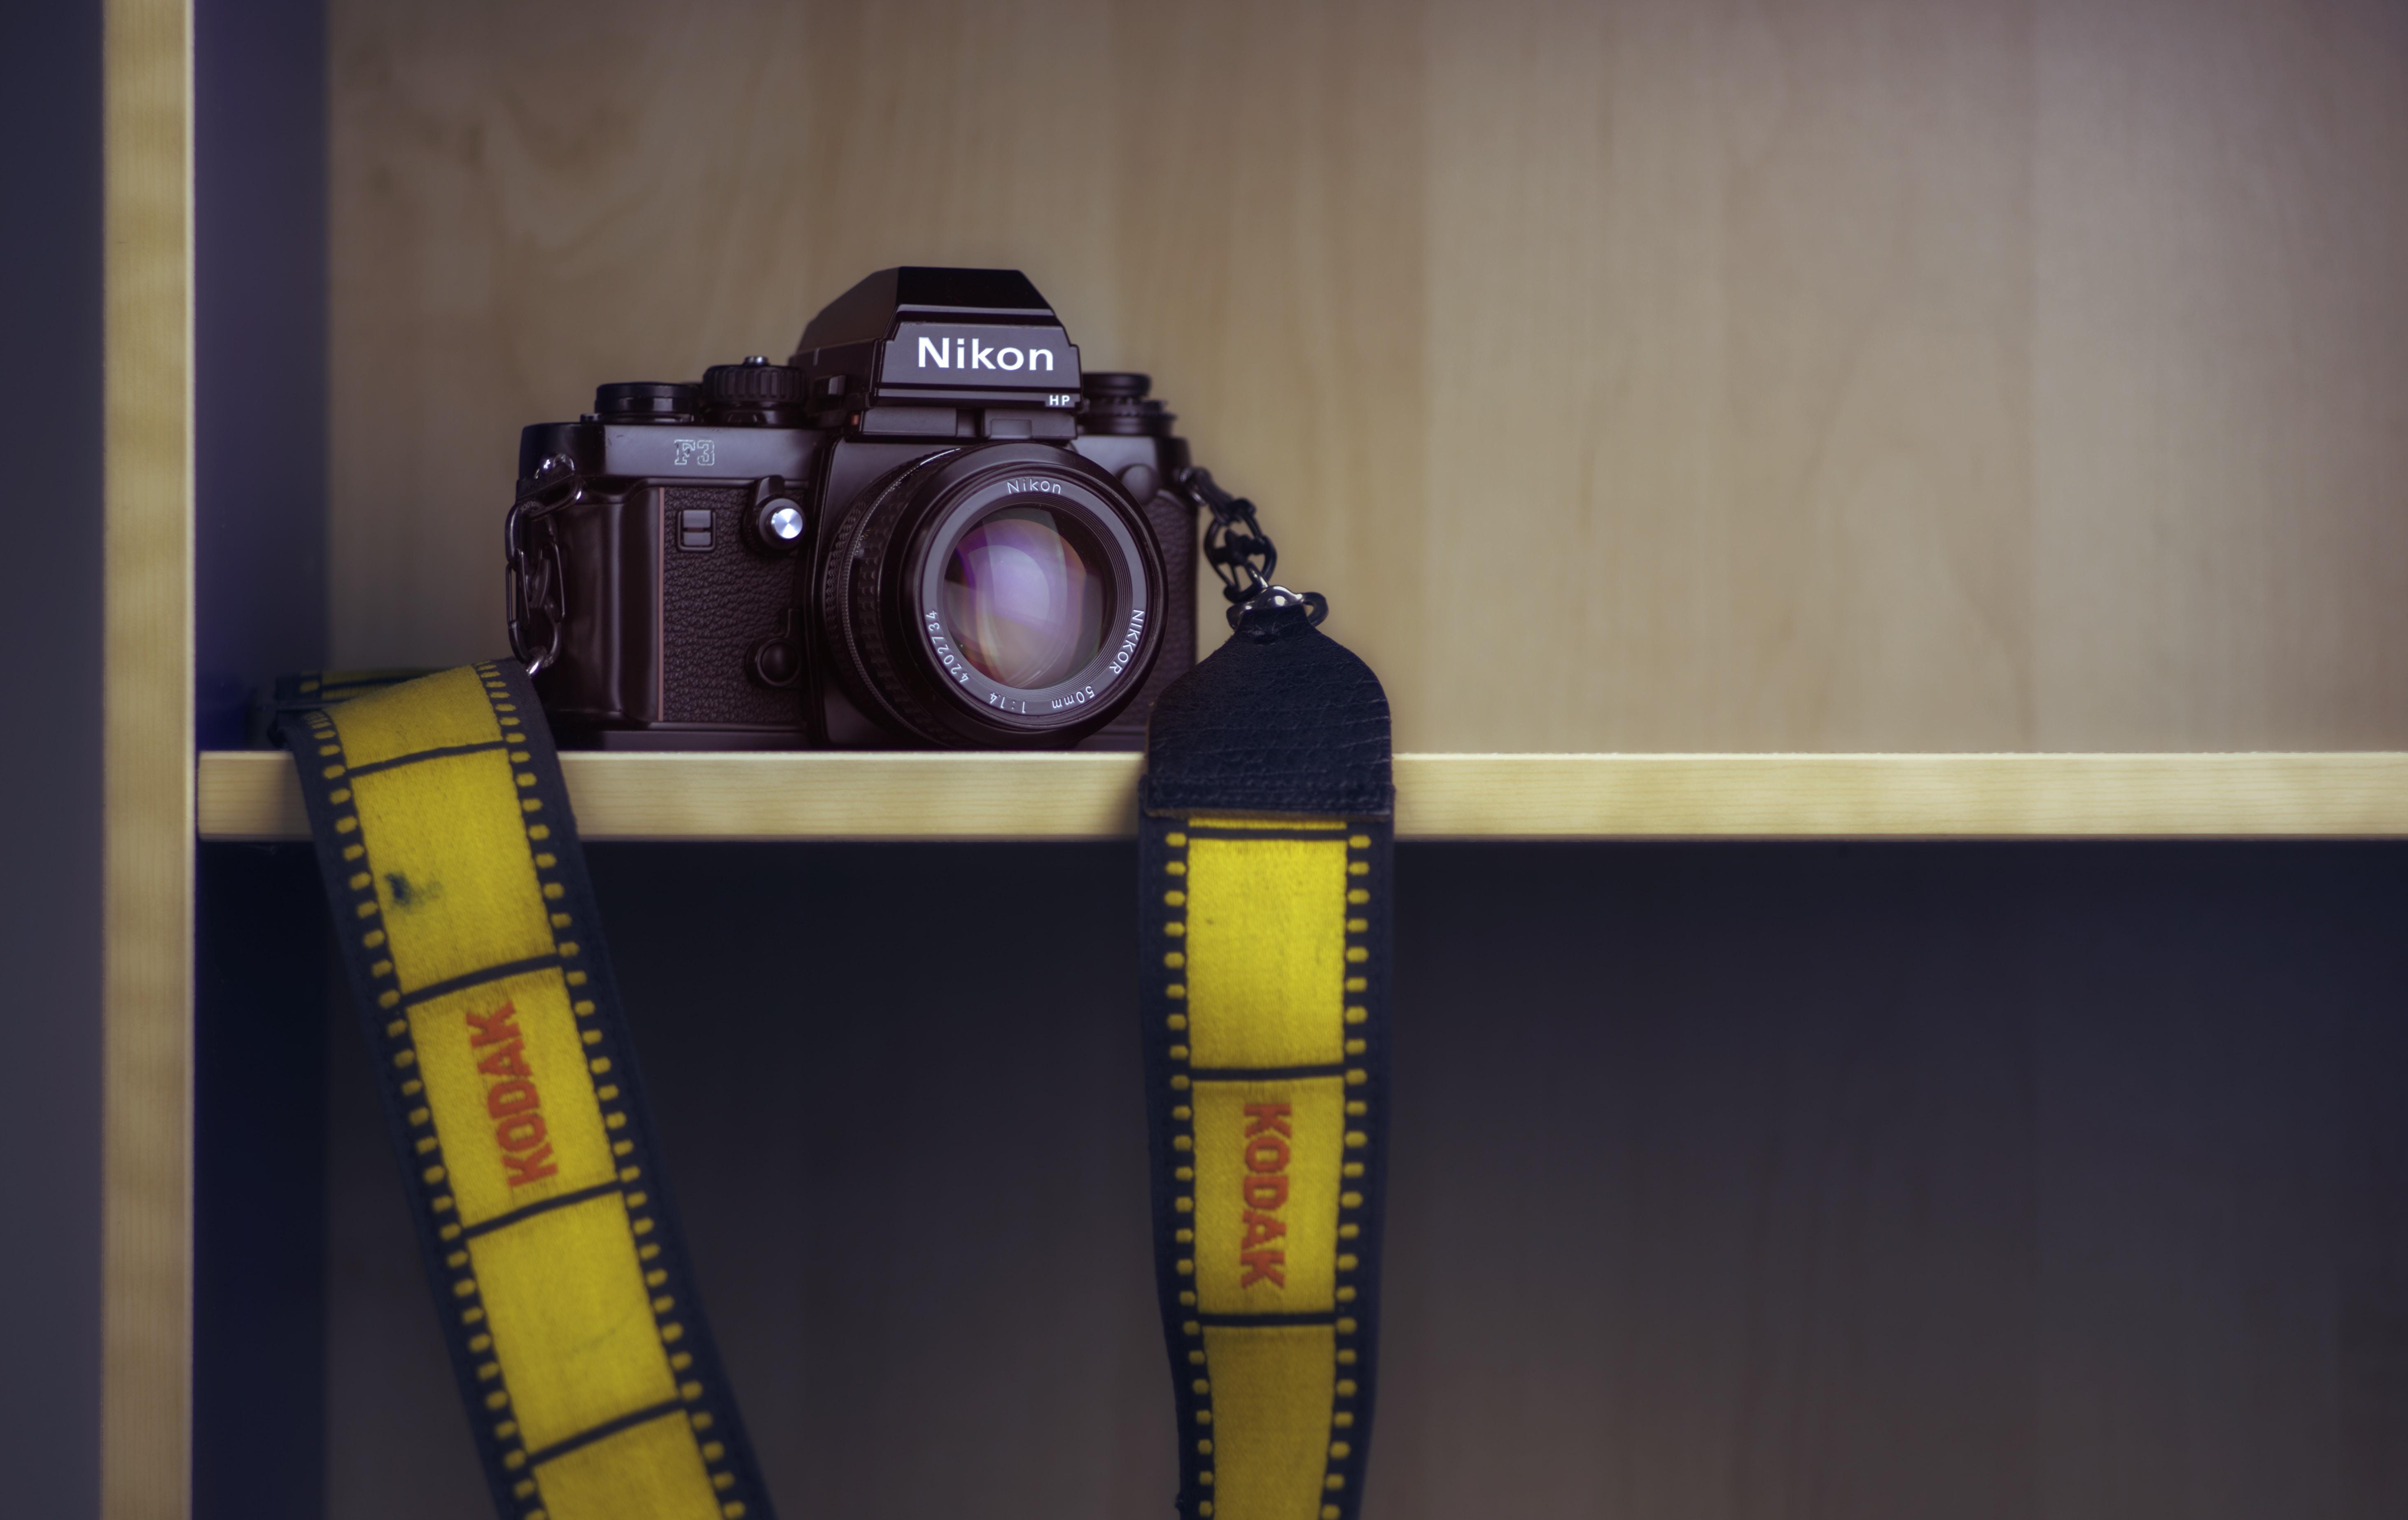 black Nikon DSLR camera on brown wooden shelf